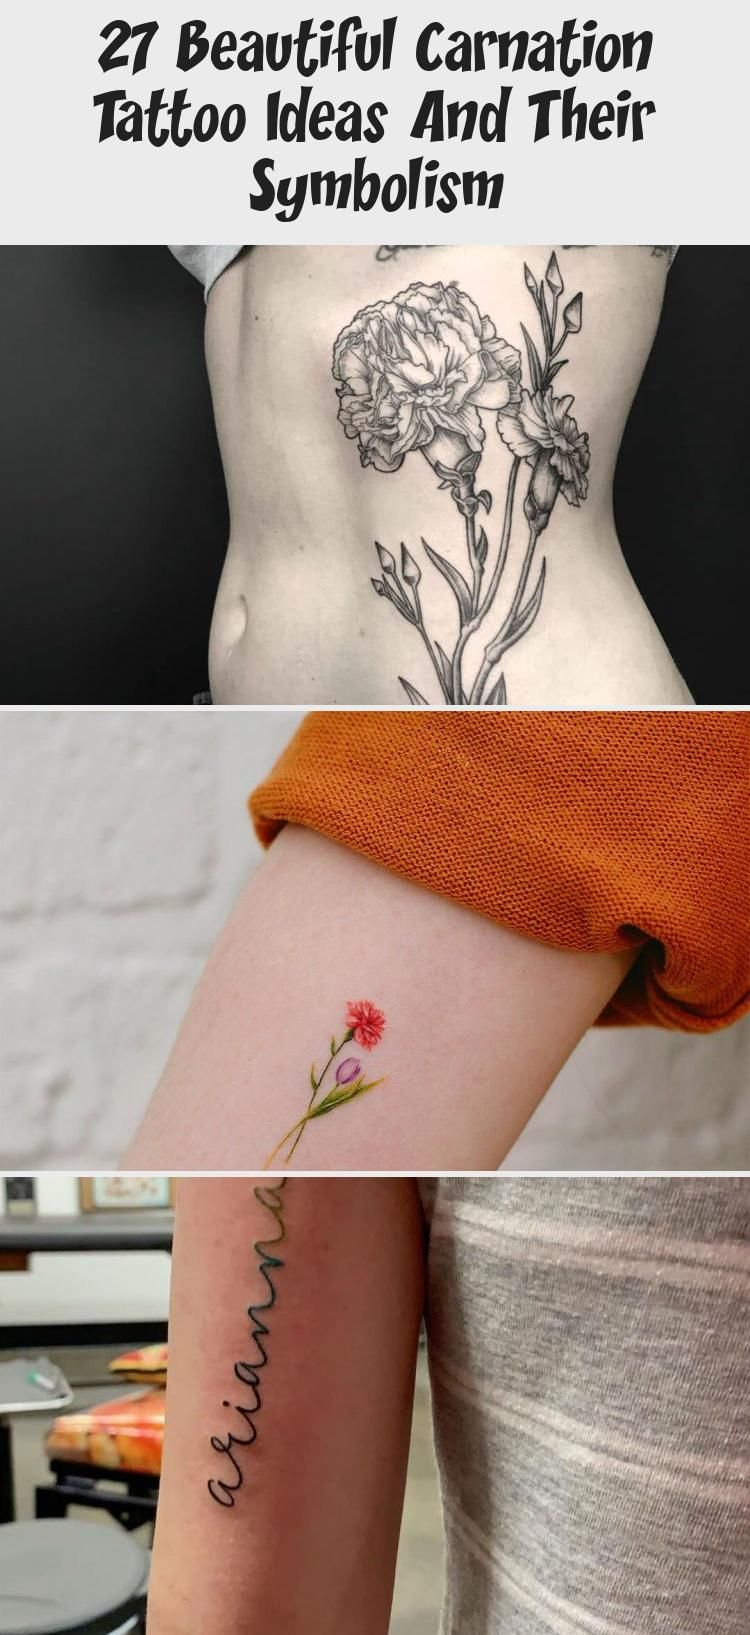 Photo of 27 Beautiful Carnation Tattoo Ideas And Their Symbolism – Tattoos